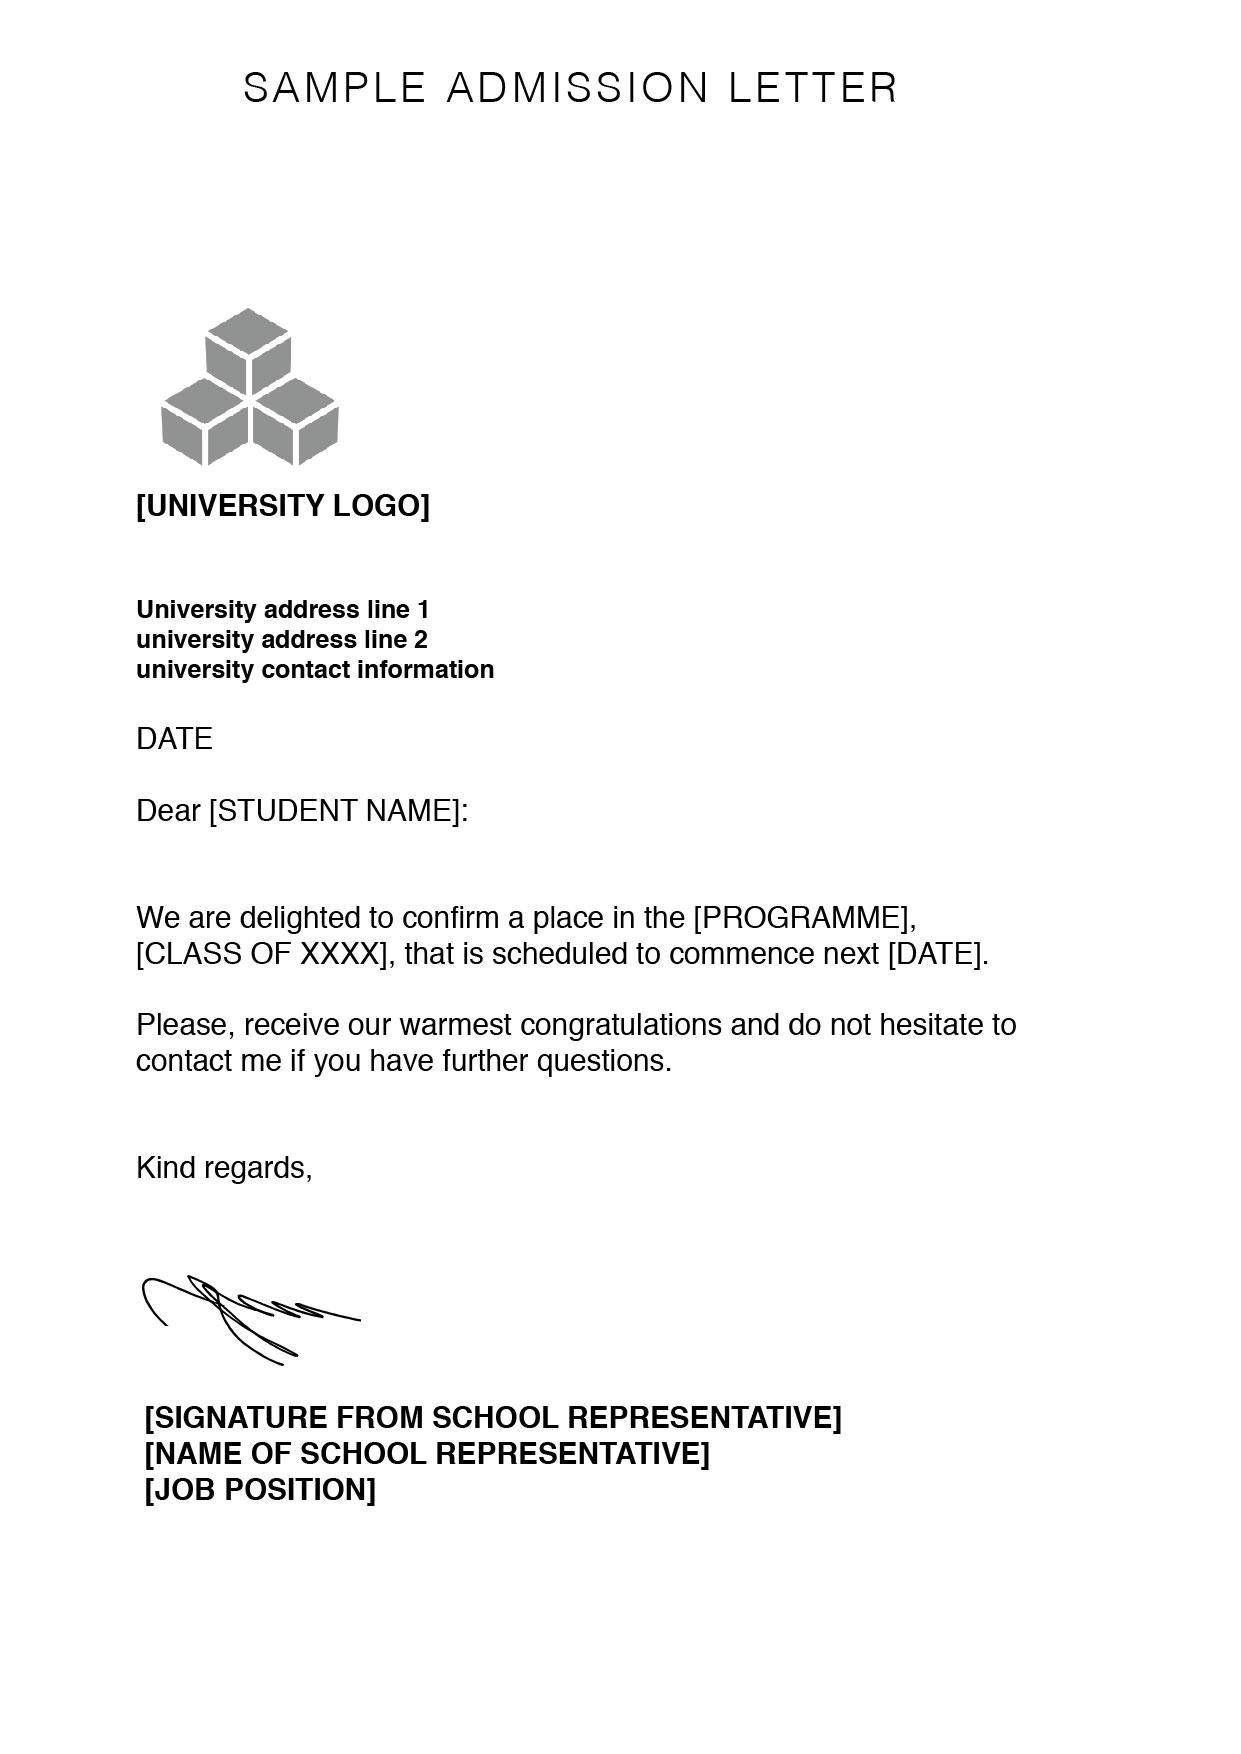 Pin By Sriram On Elevation 1001 House Design Lettering